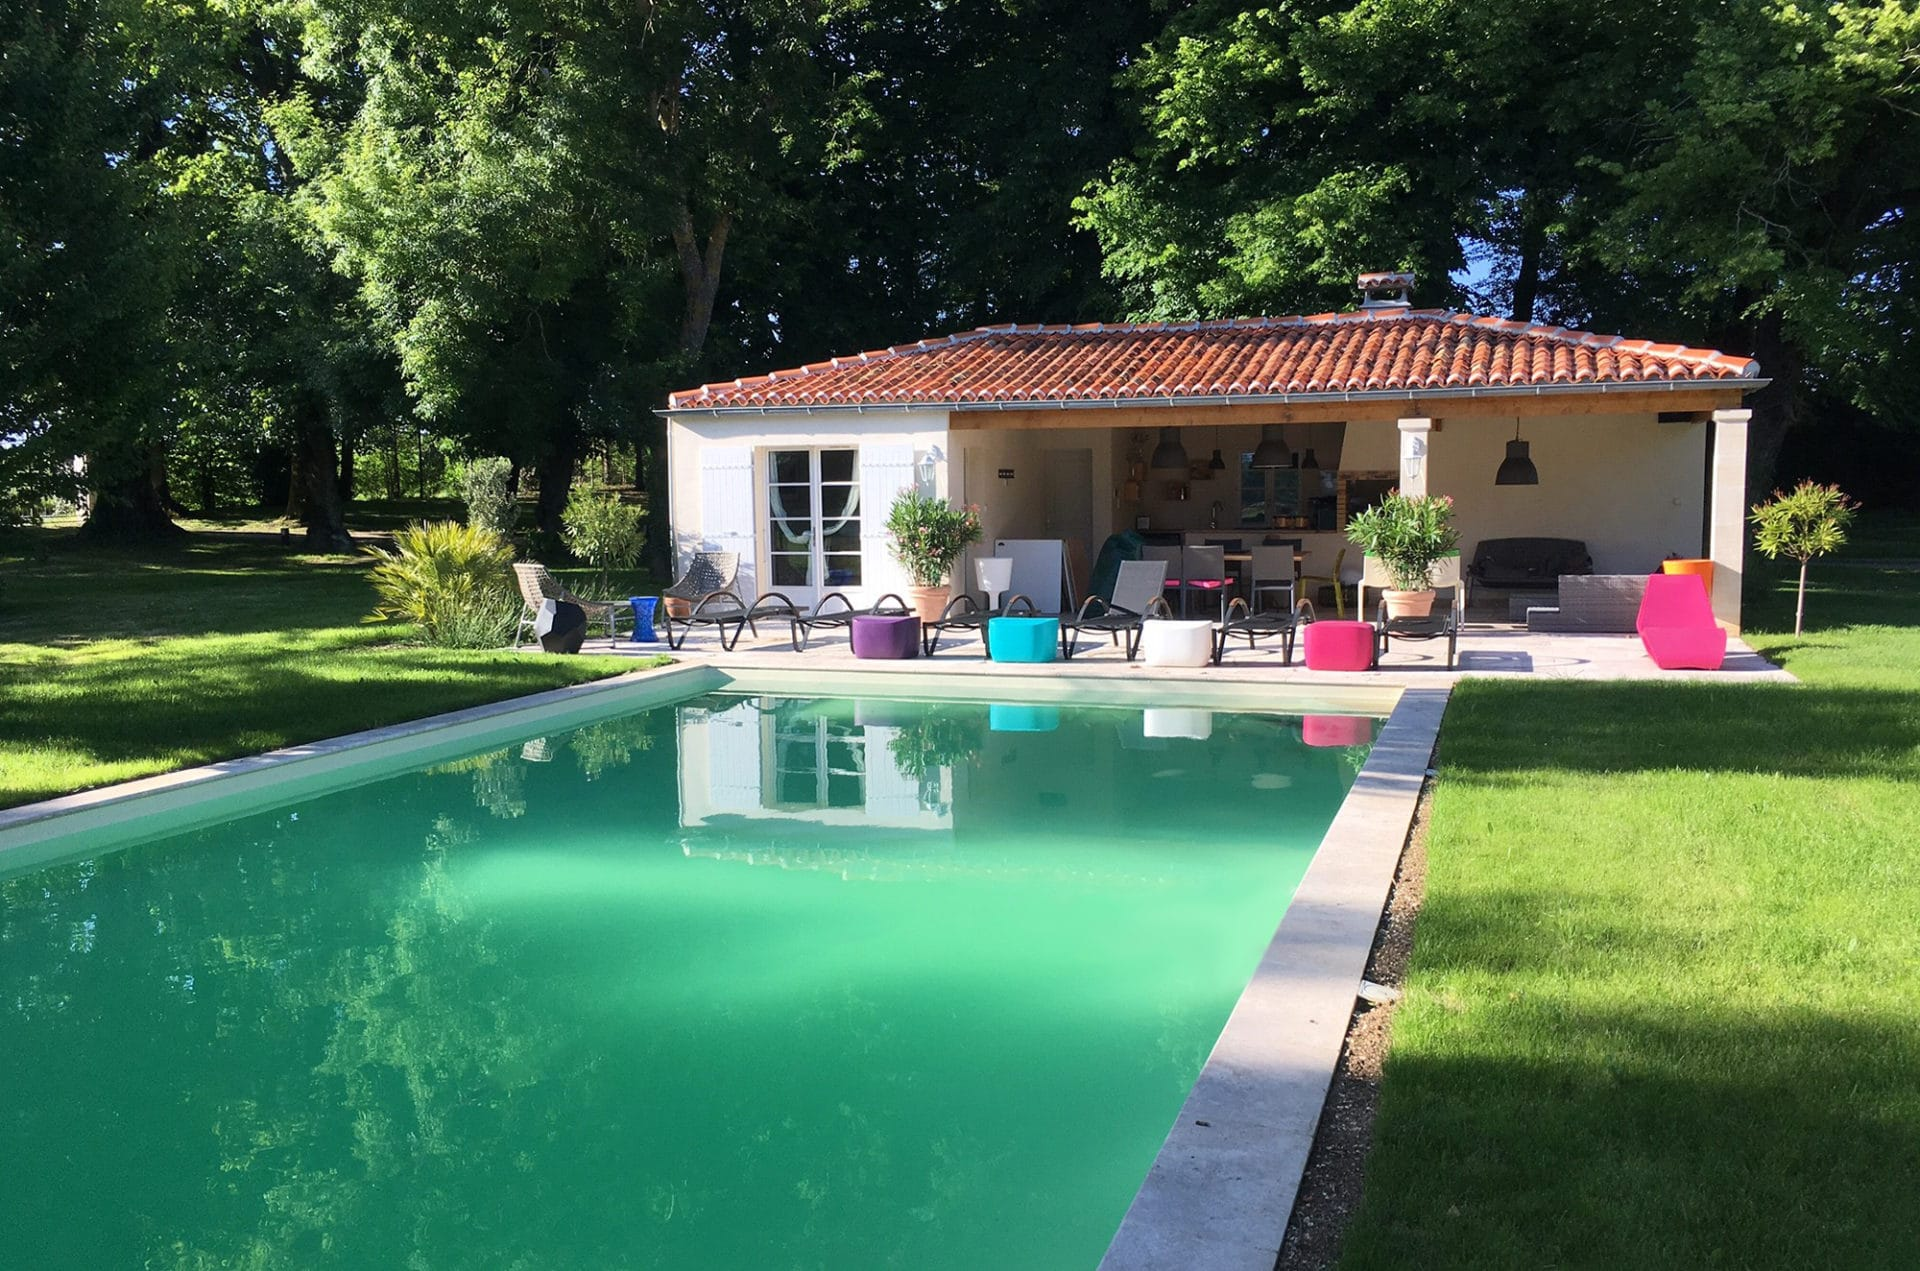 Construire sa piscine construction de piscine illico for Travaux piscine